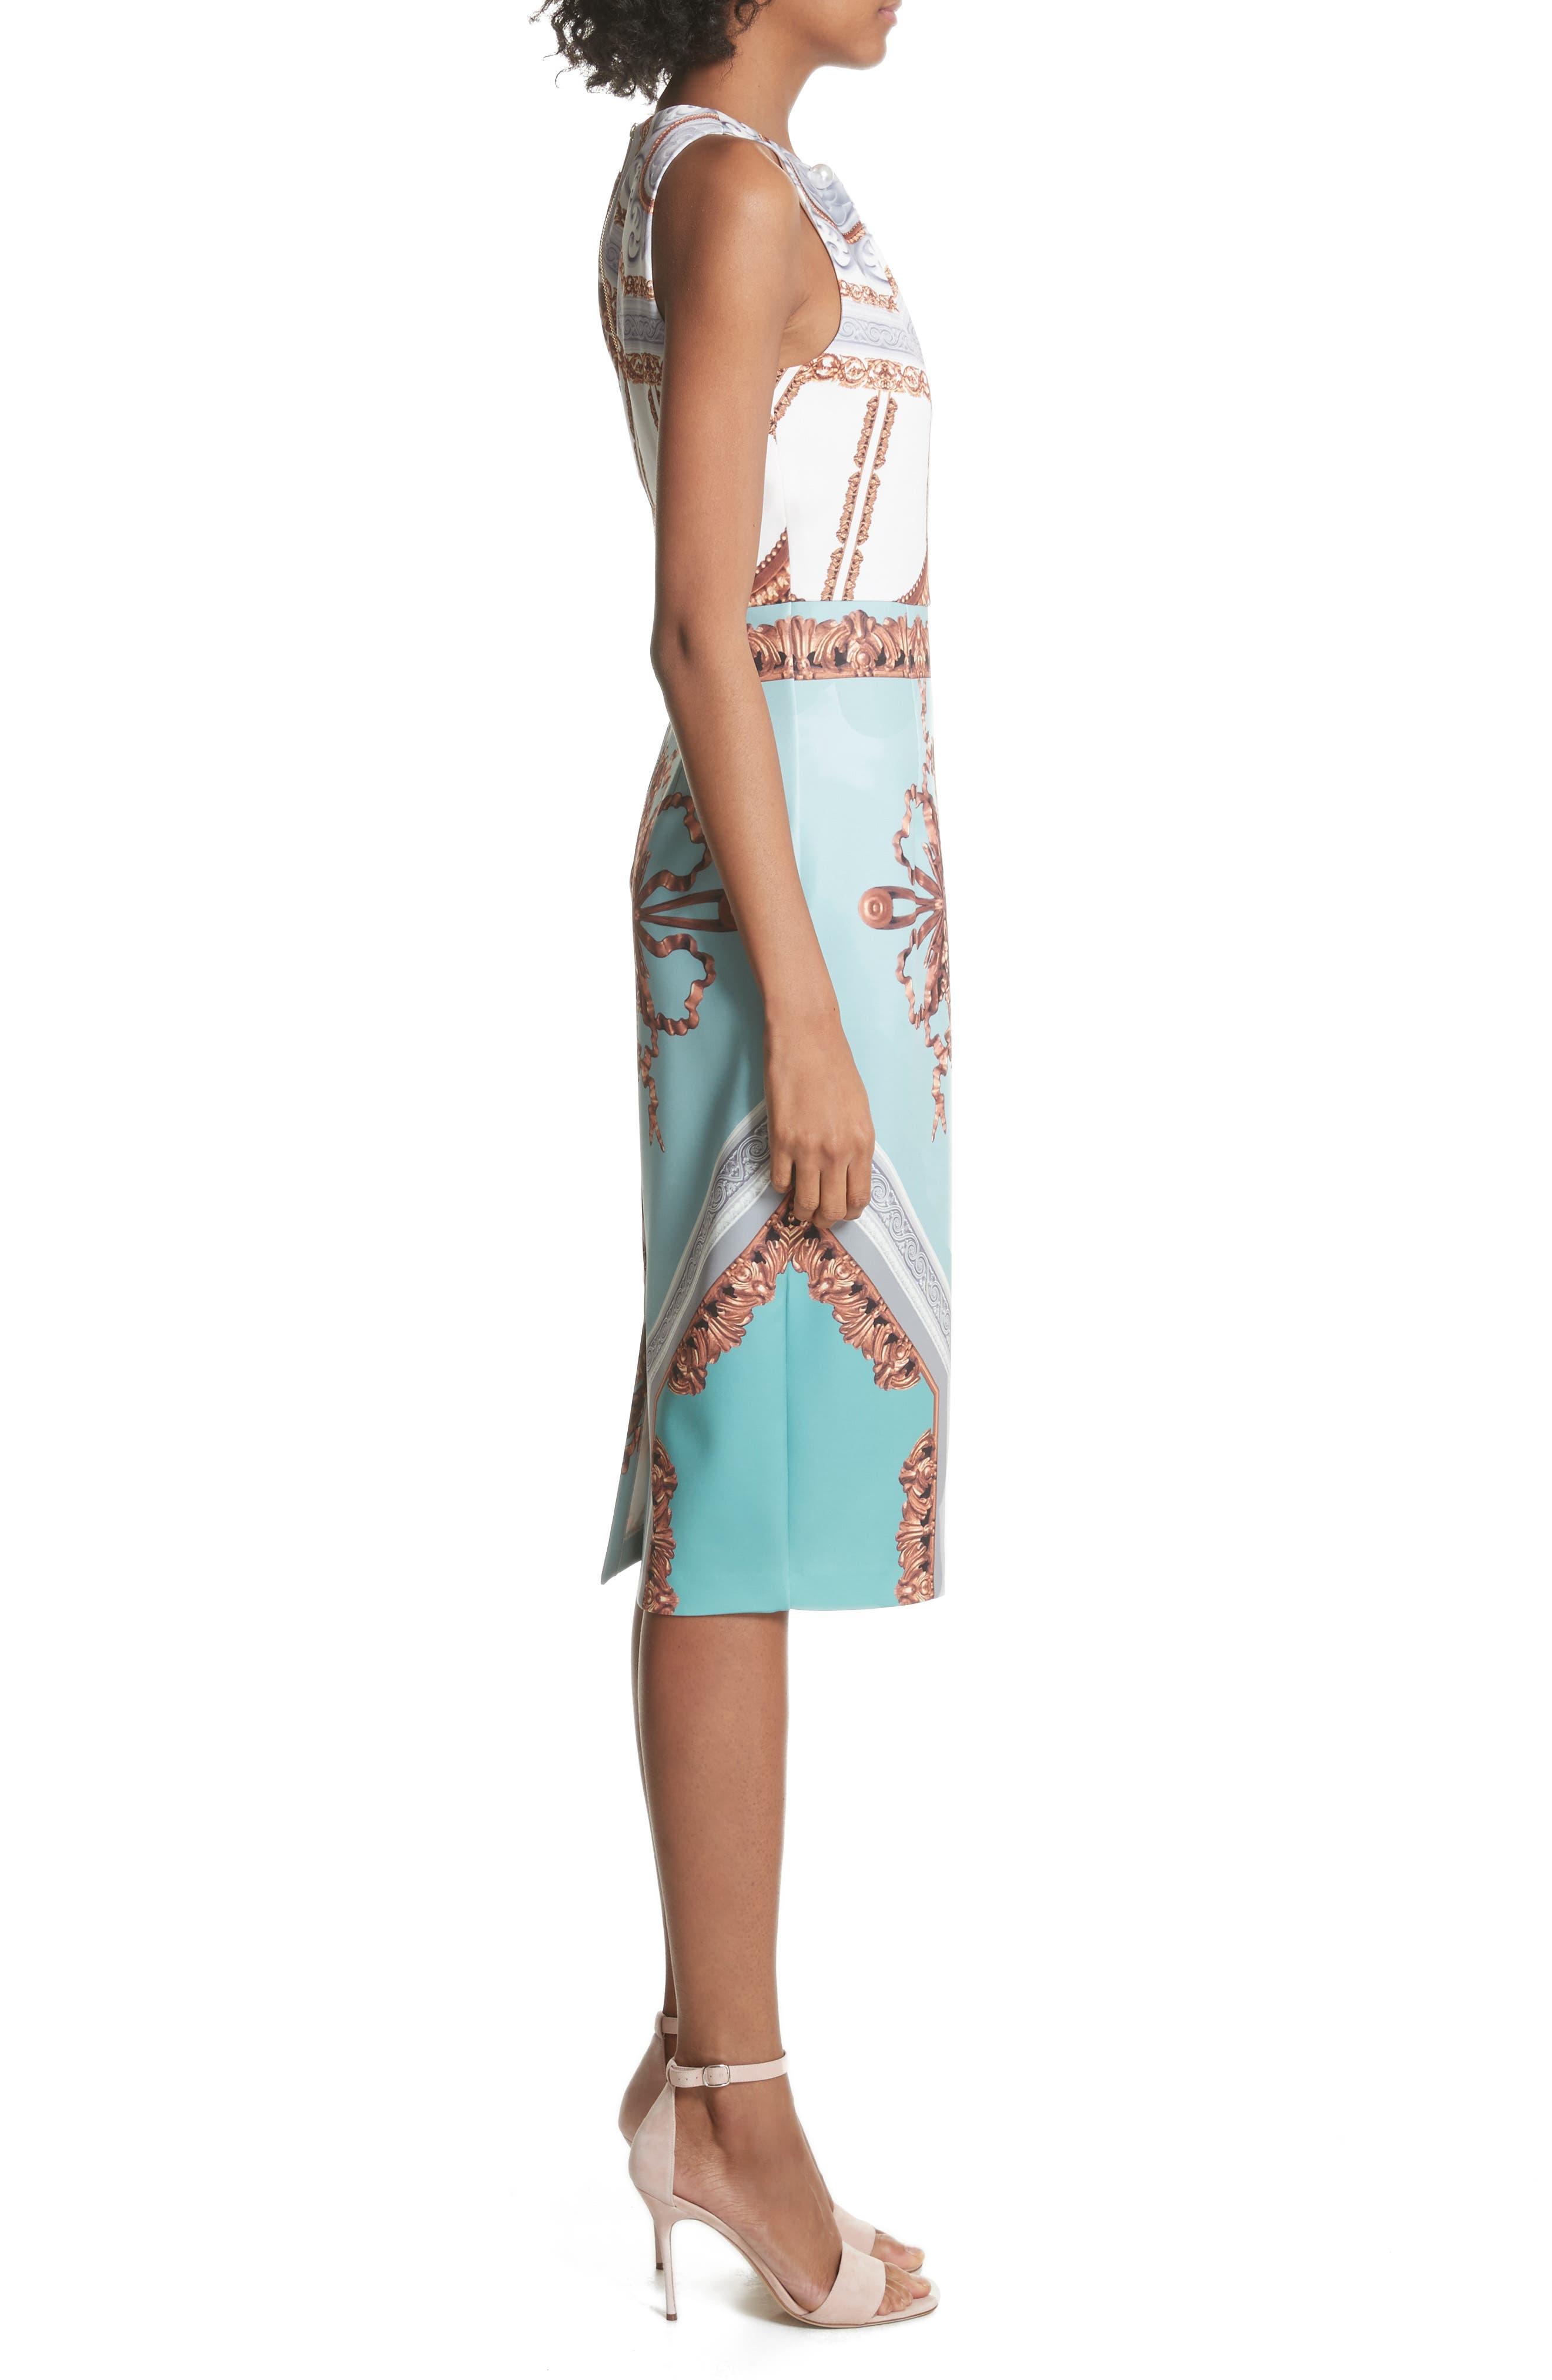 Orlla Embellished Midi Dress,                             Alternate thumbnail 3, color,                             440